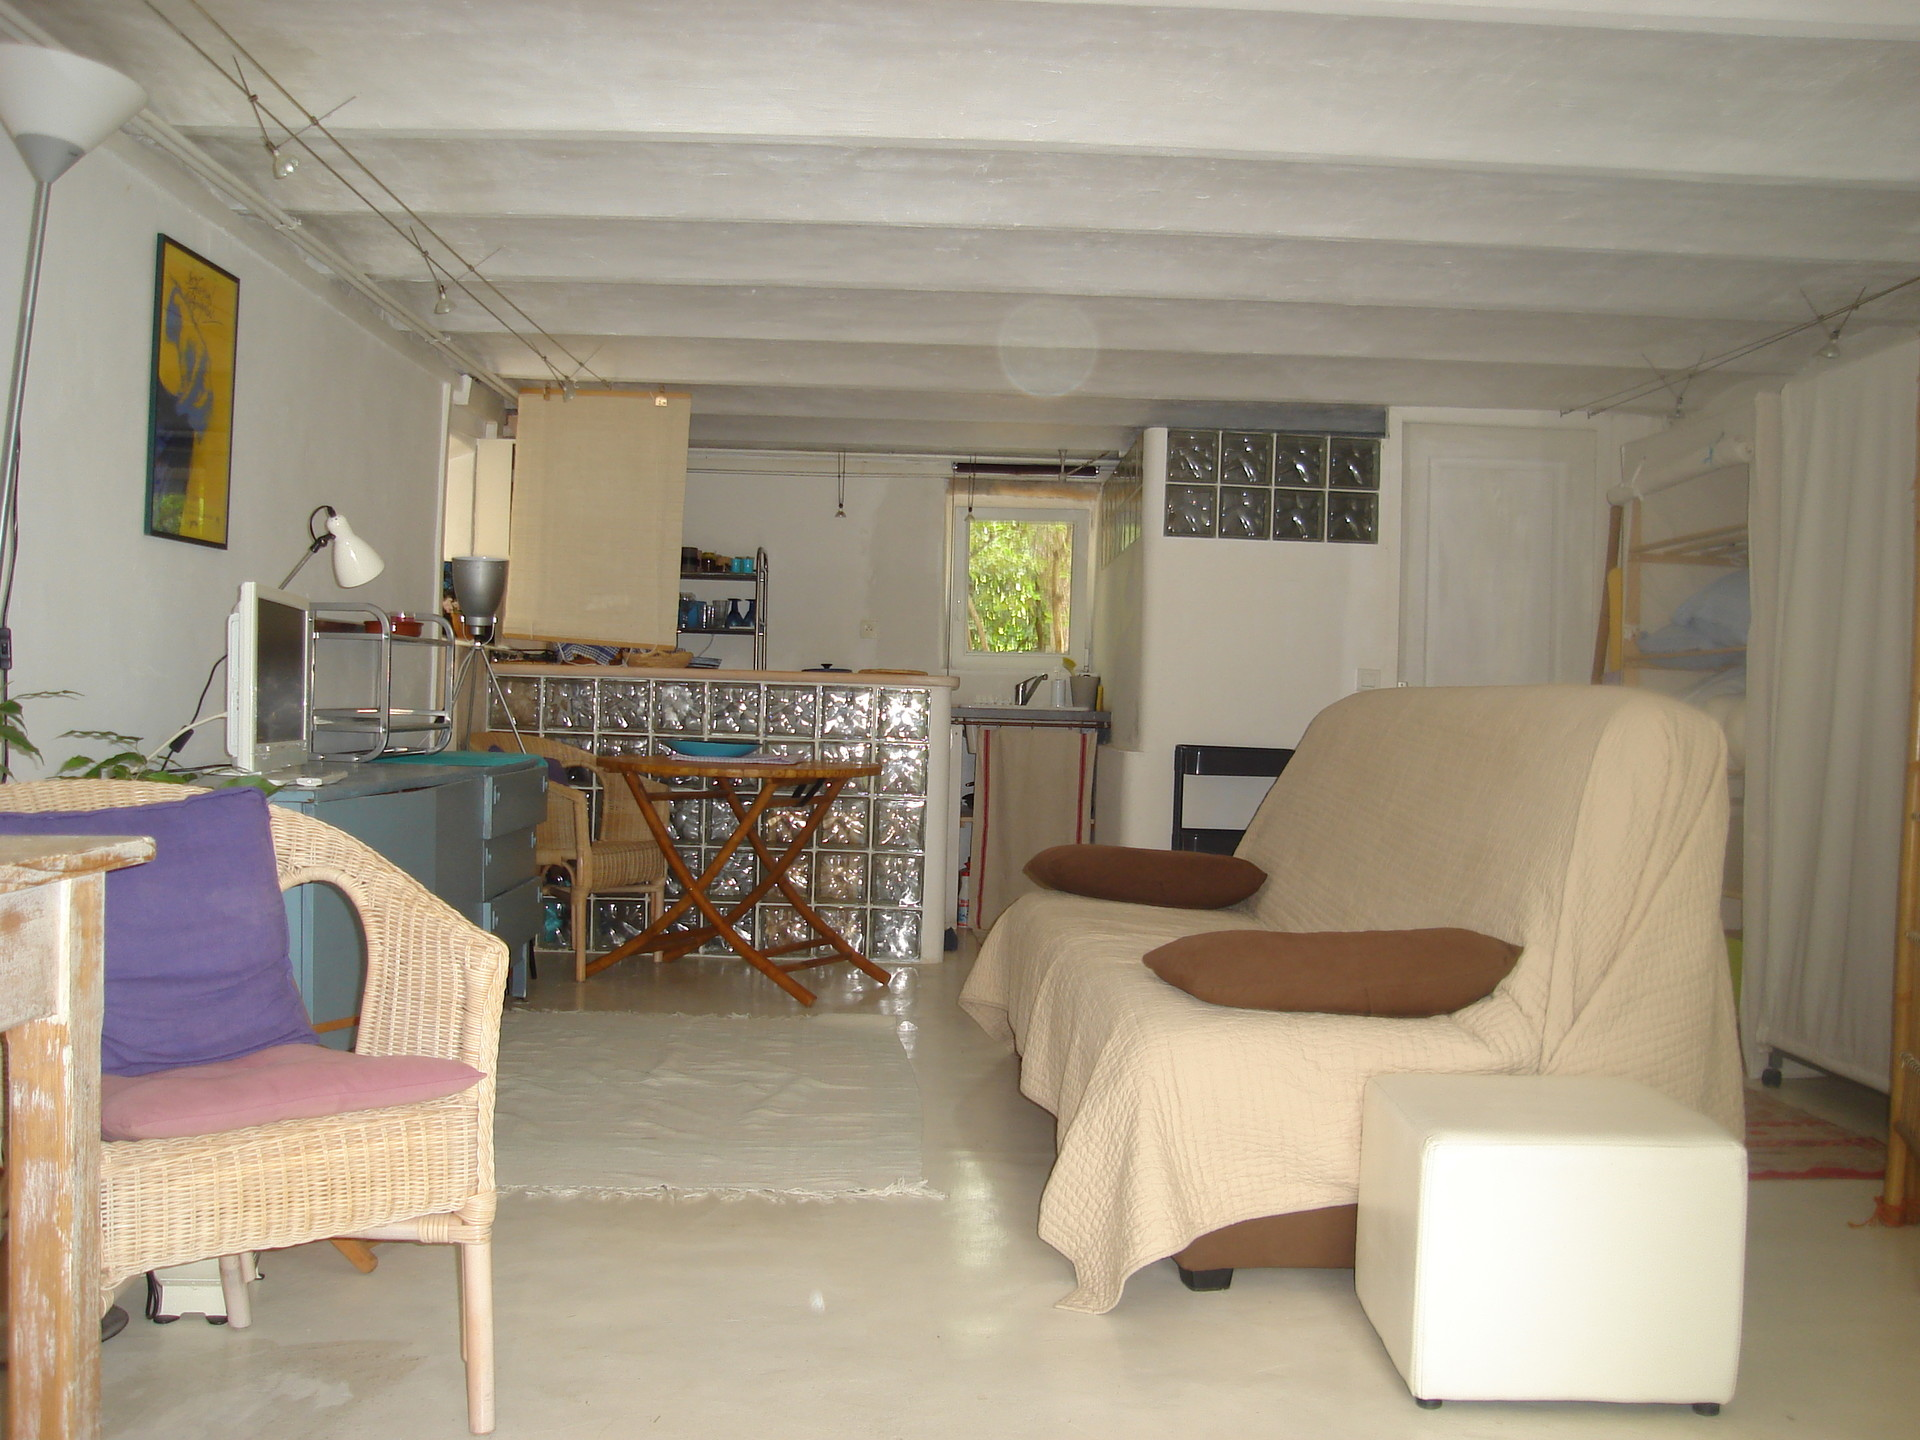 studio-rez-de-jardin-3f65f334988b71d108d